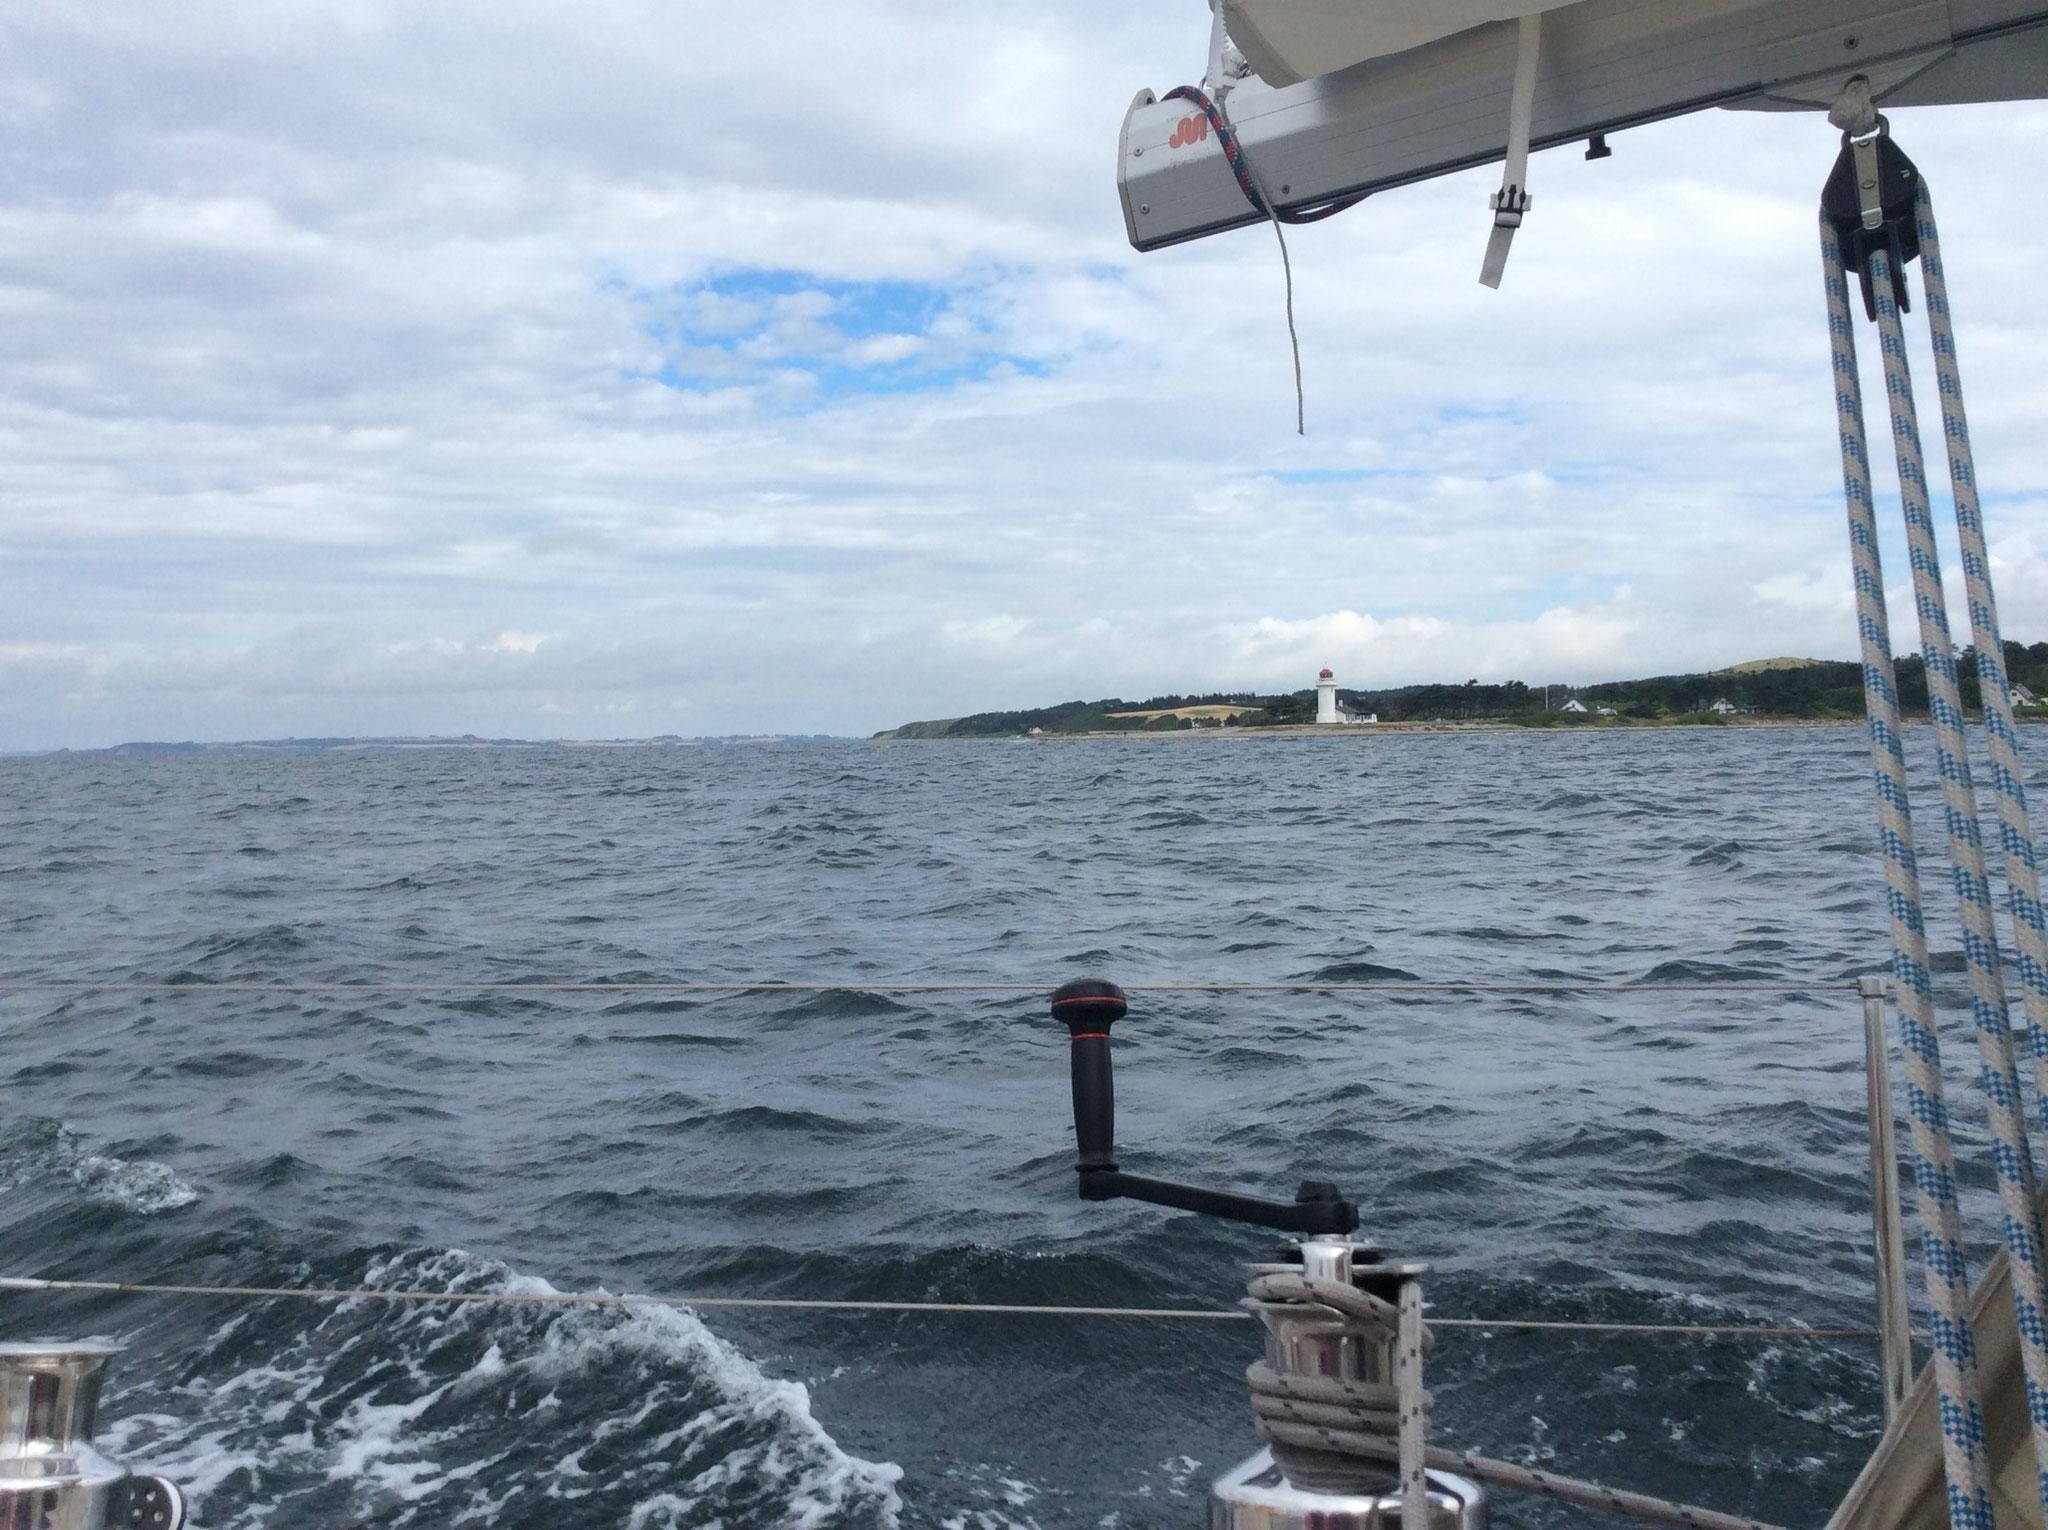 Leuchtturm Sletterhage an Backbord passiert